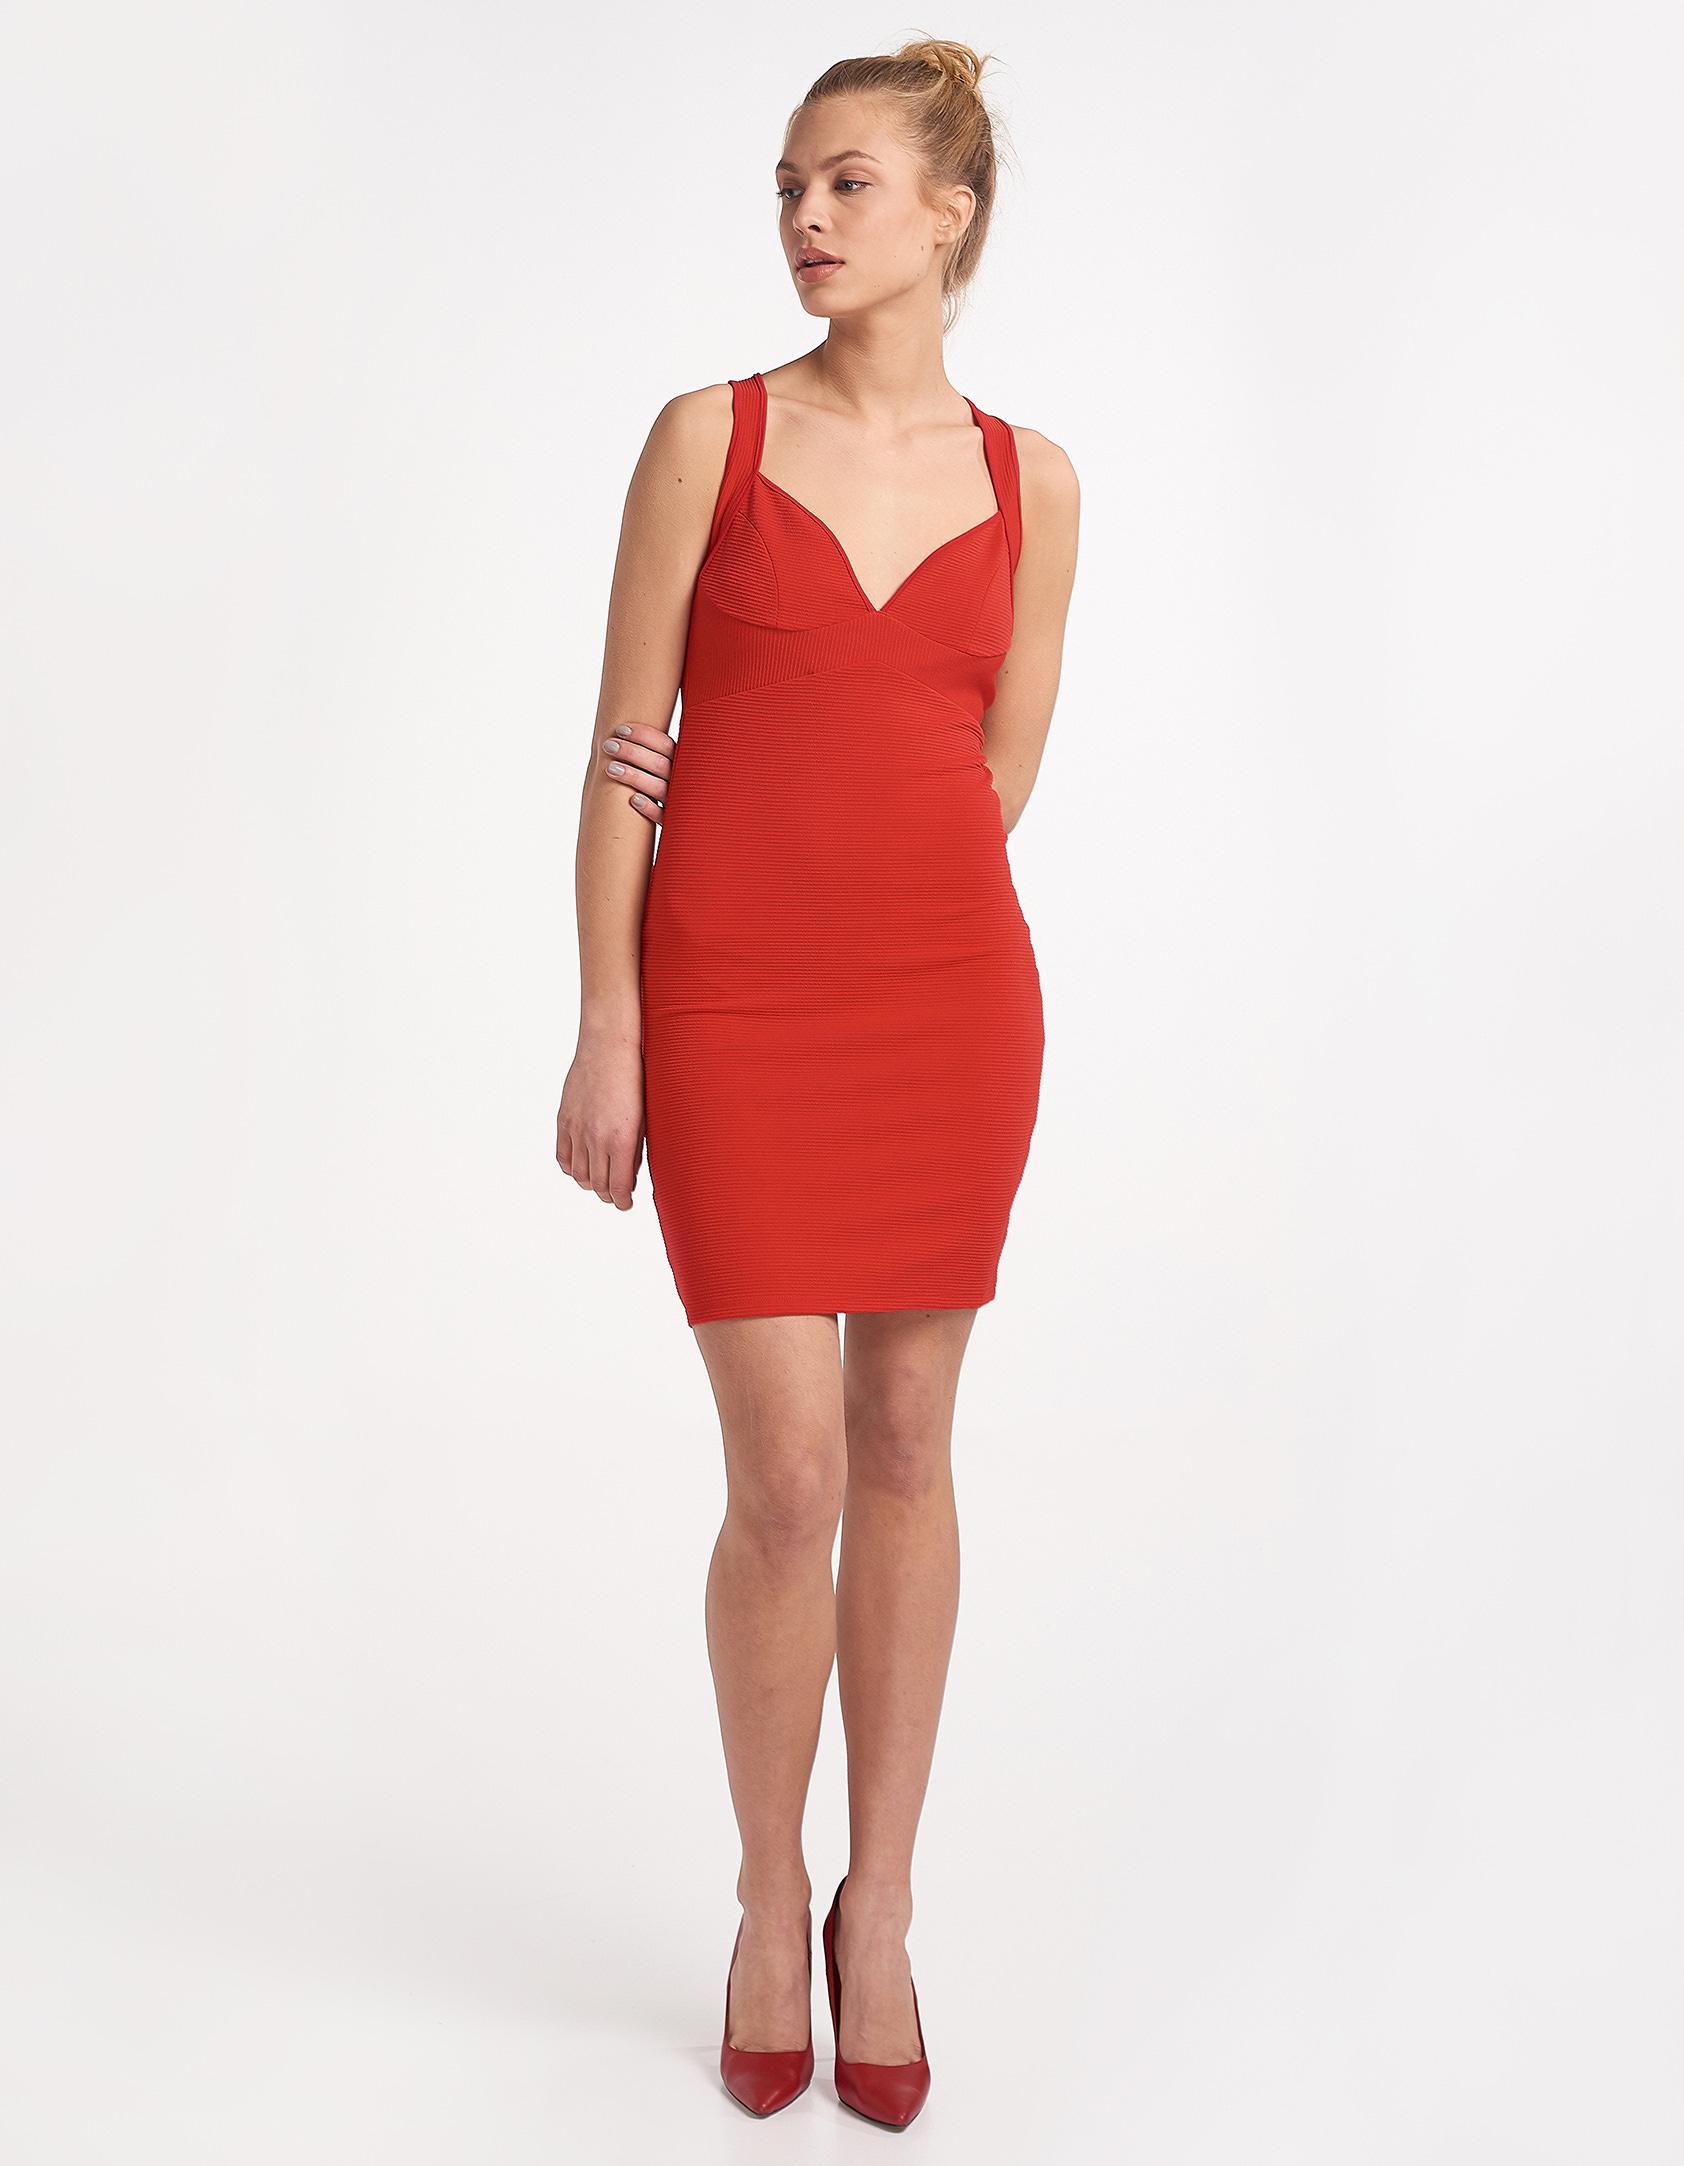 555a833561f Φόρεμα με χιαστί τιράντες στην πλάτη - Issue